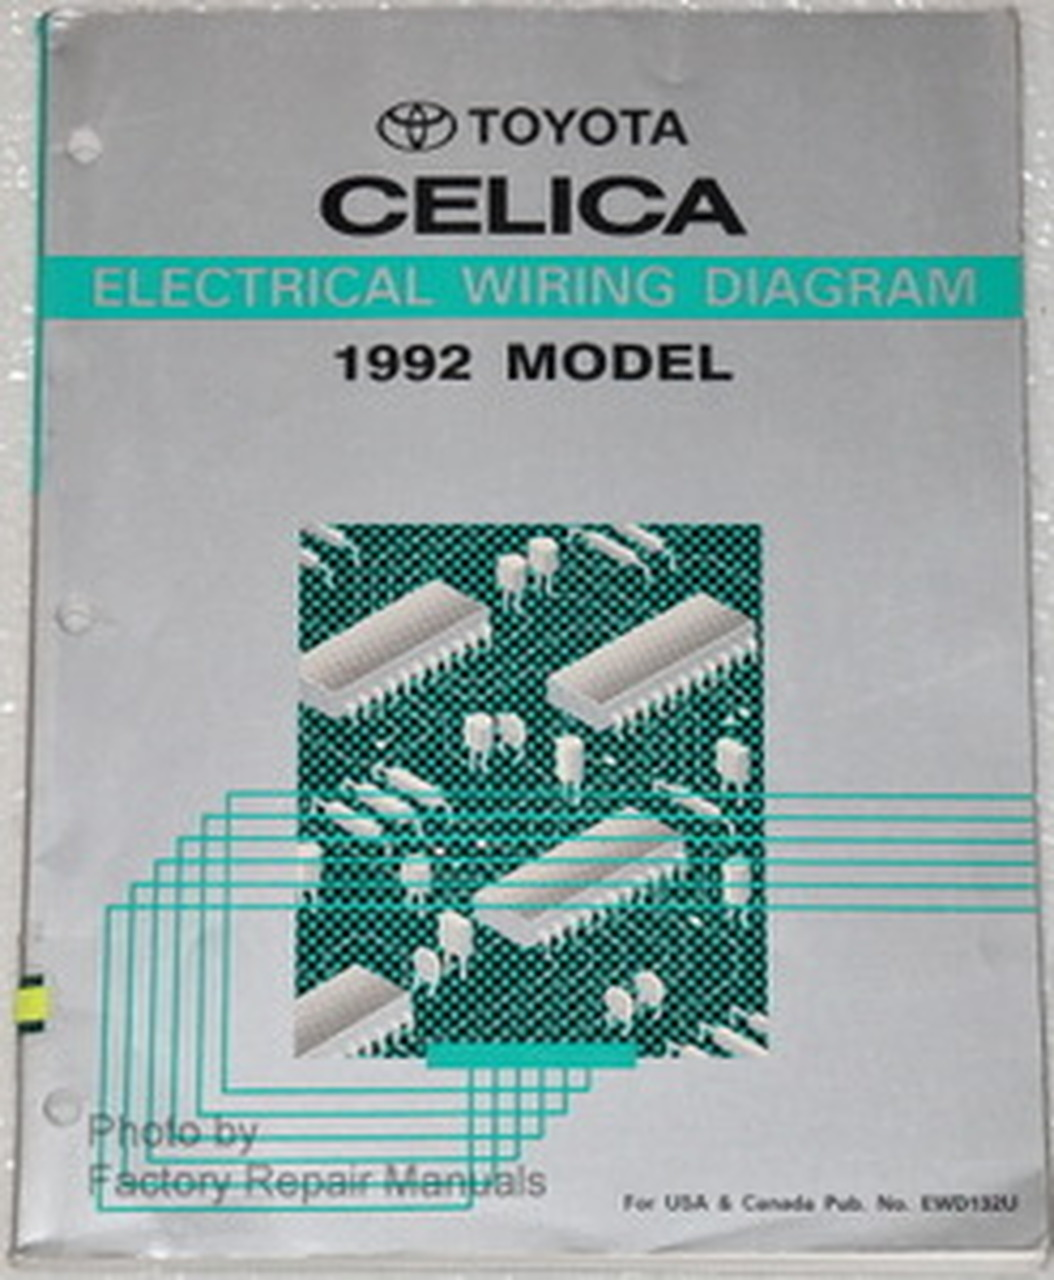 1992 Toyota Celica Manual